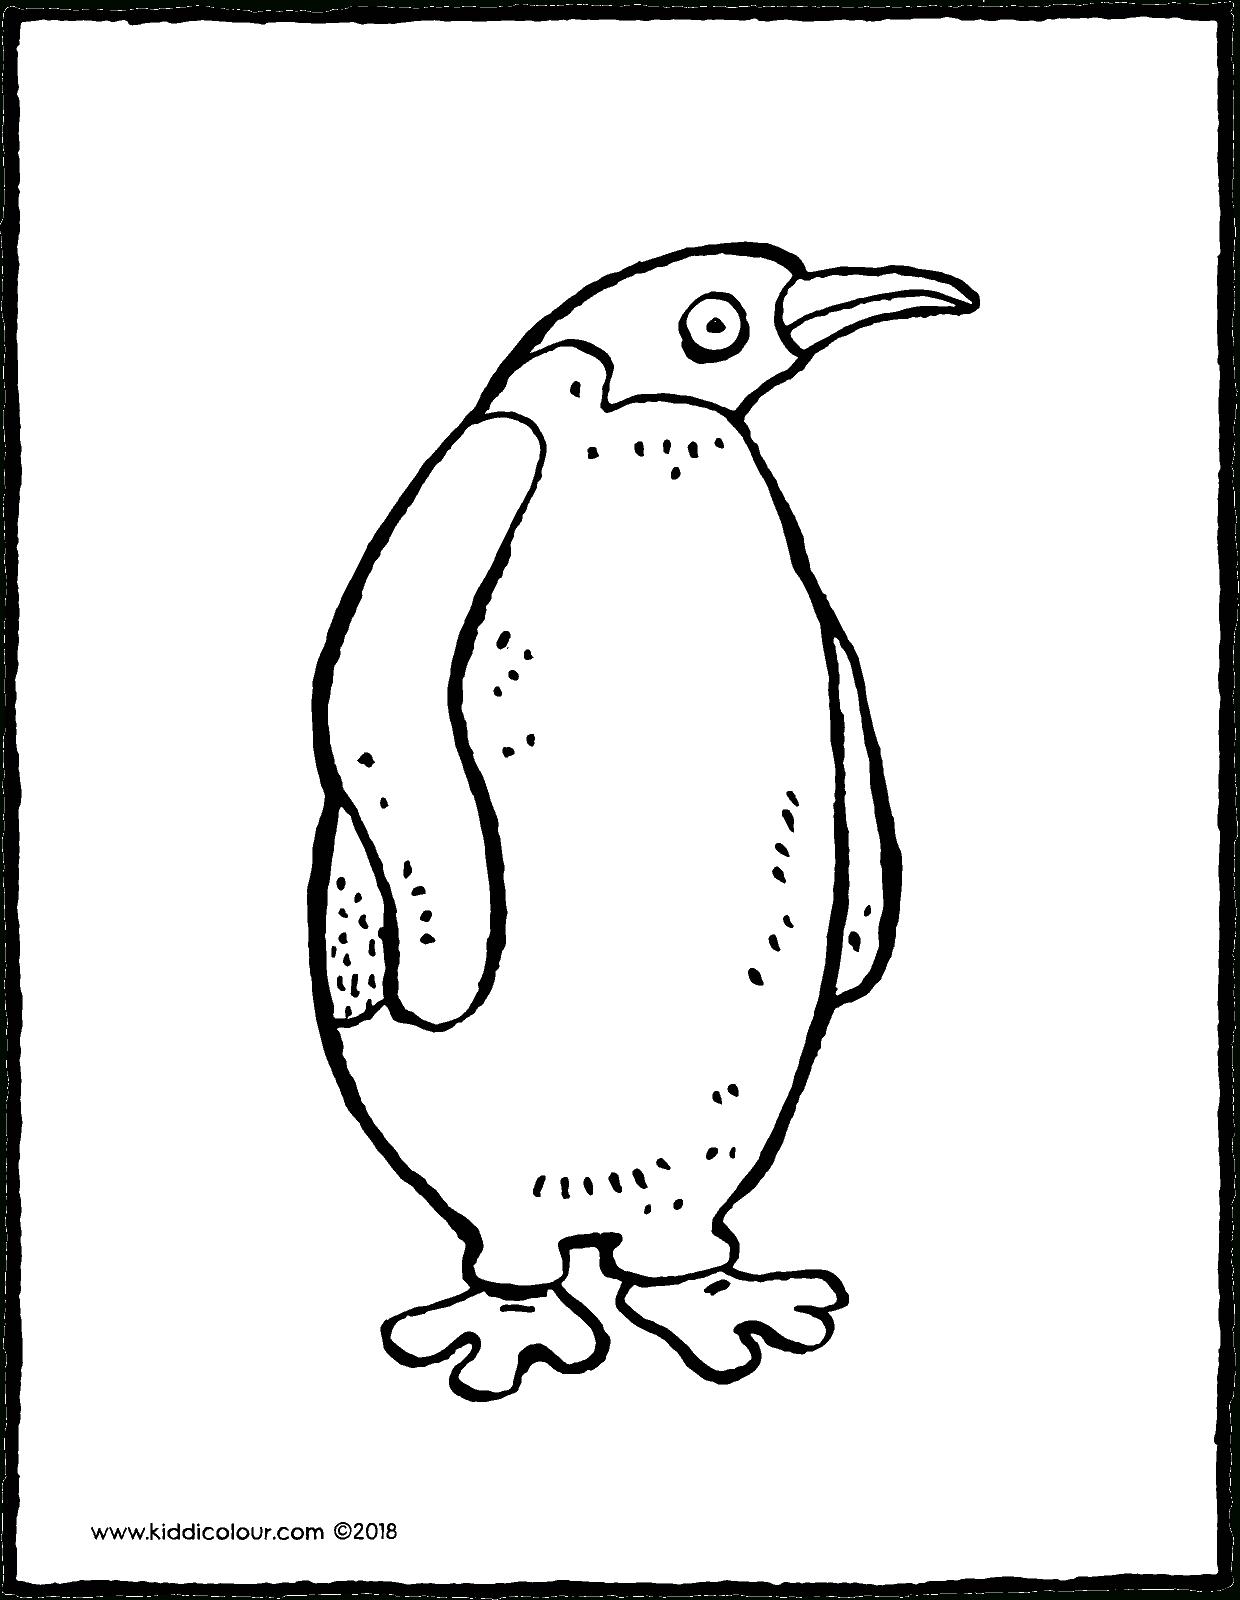 Pinguin - Kiddimalseite mit Pinguin Malvorlage